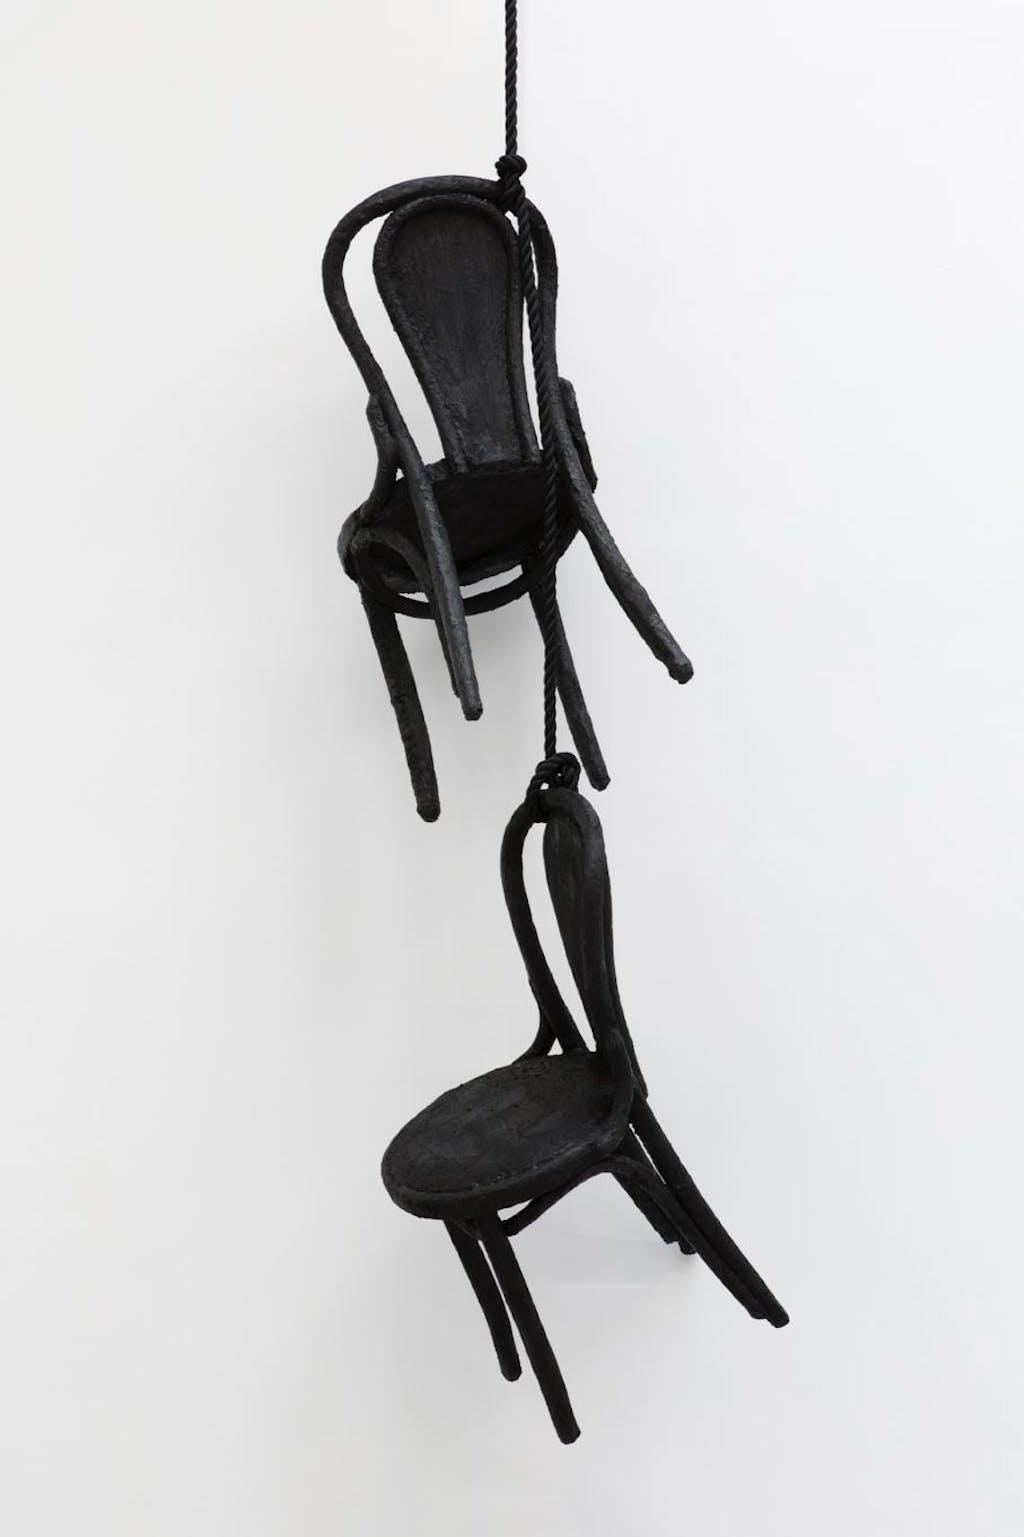 Untitled / Chairs - © kamel mennour